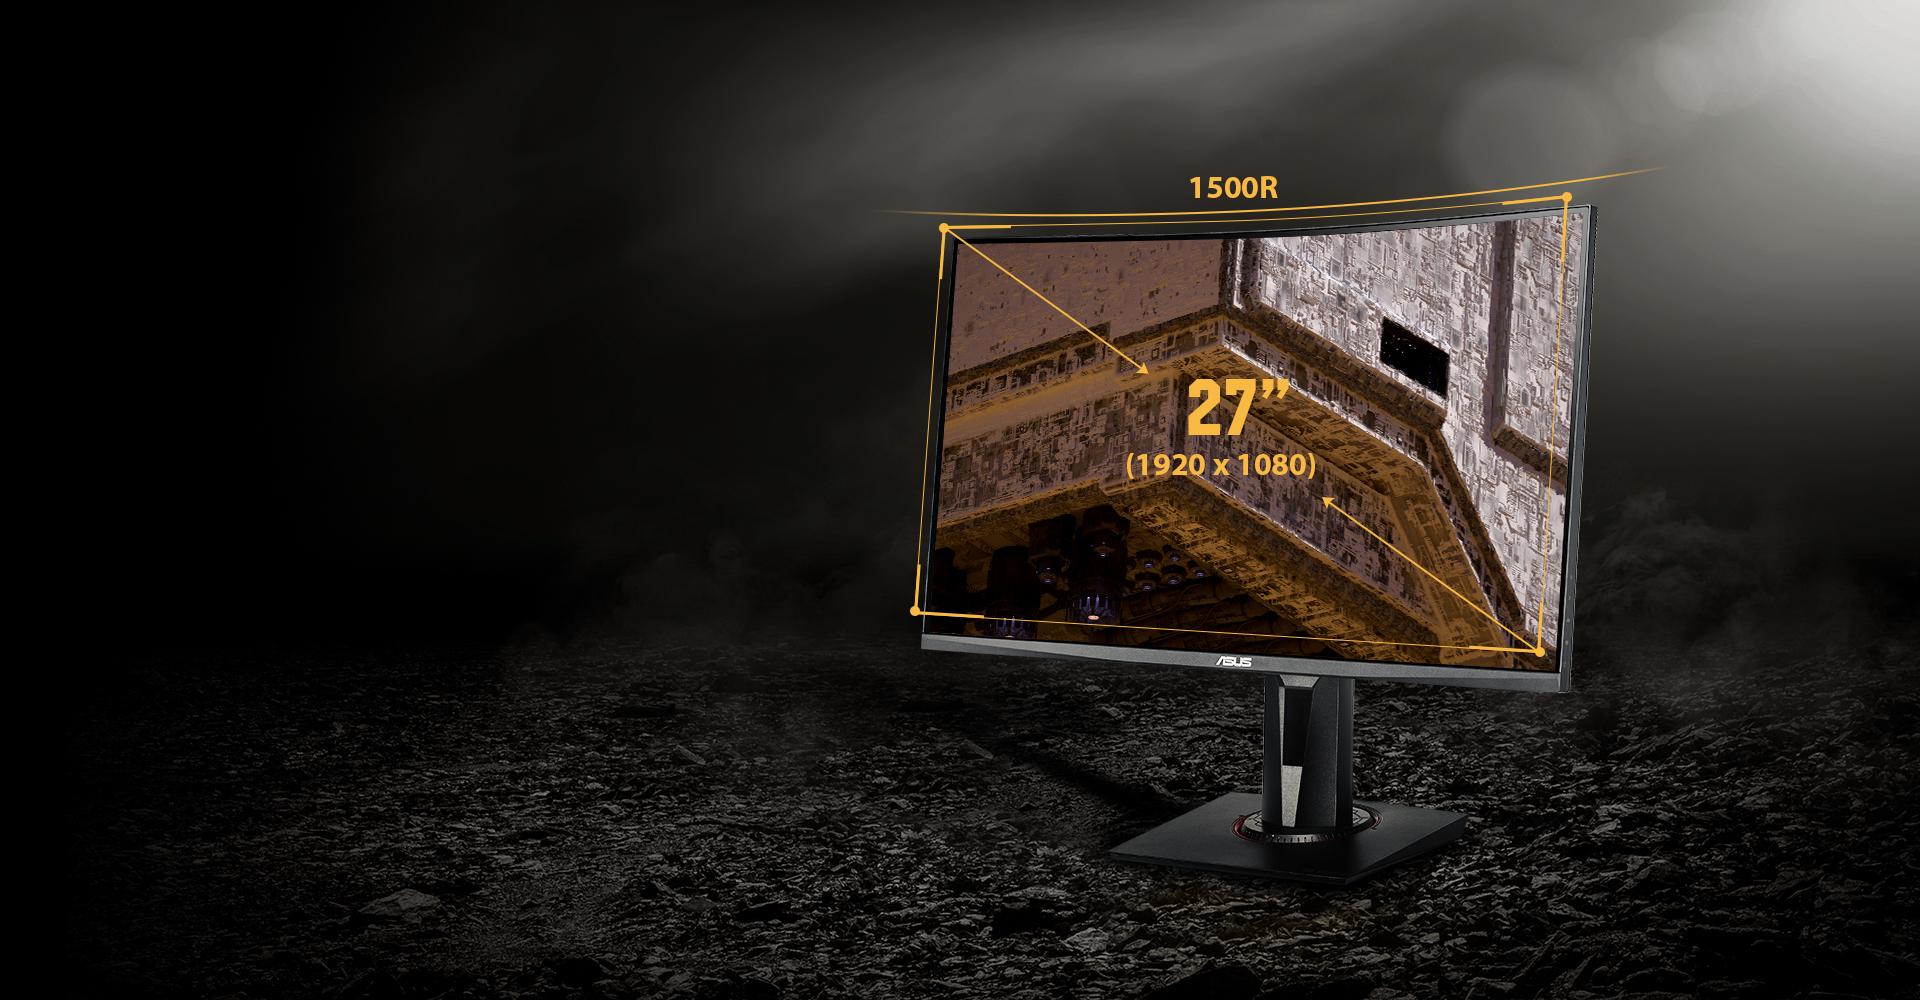 Asus Tuf Gaming Vg27vq 27 Full Hd 1920 X 1080 165hz Extreme Low Motion Blur Adaptive Sync Freesync 1ms Mprt Curved Gaming Monitor Newegg Com